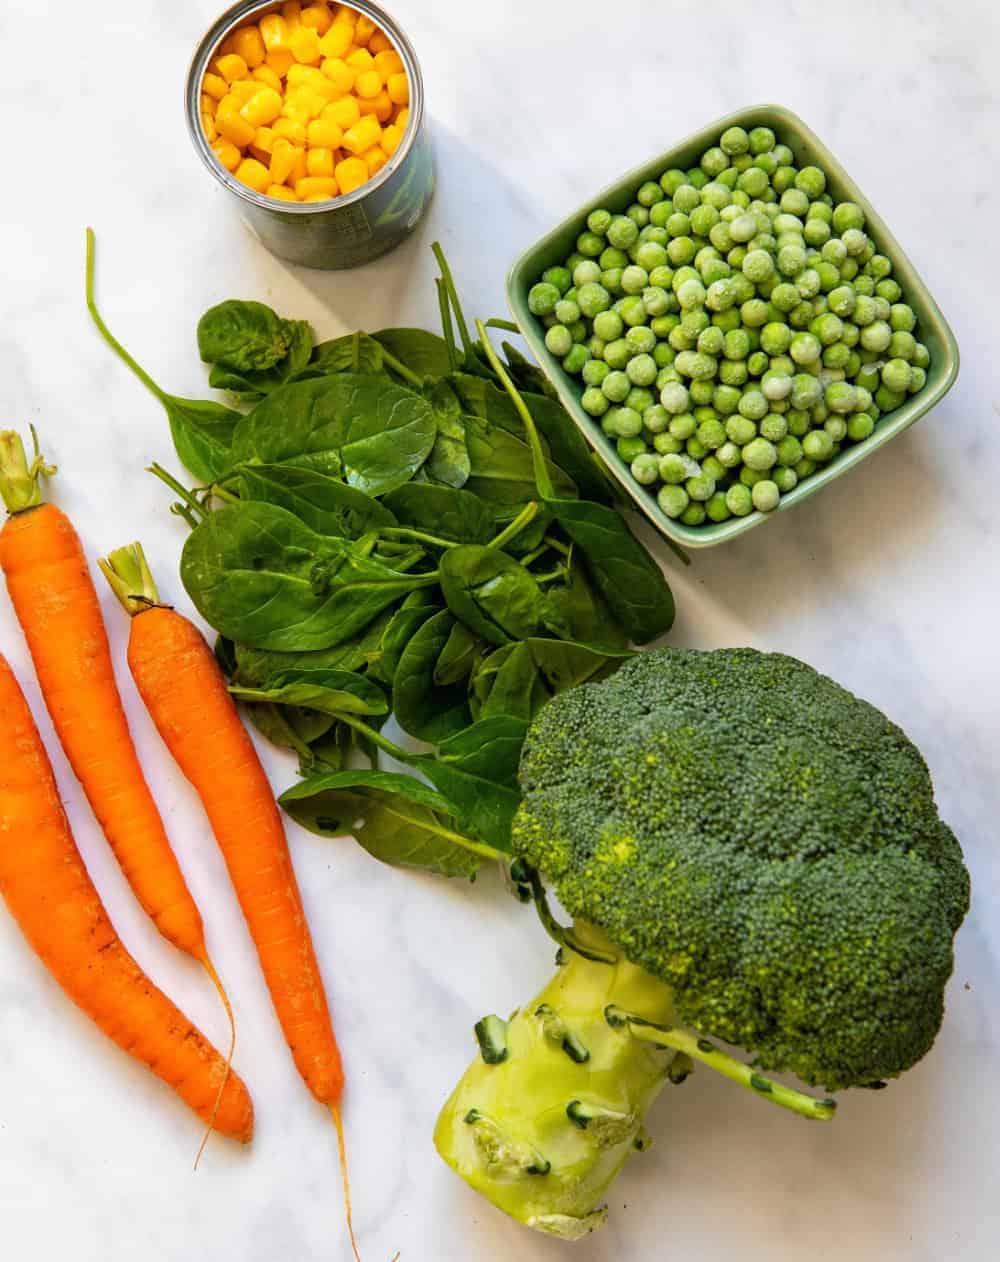 Veg Ingredients